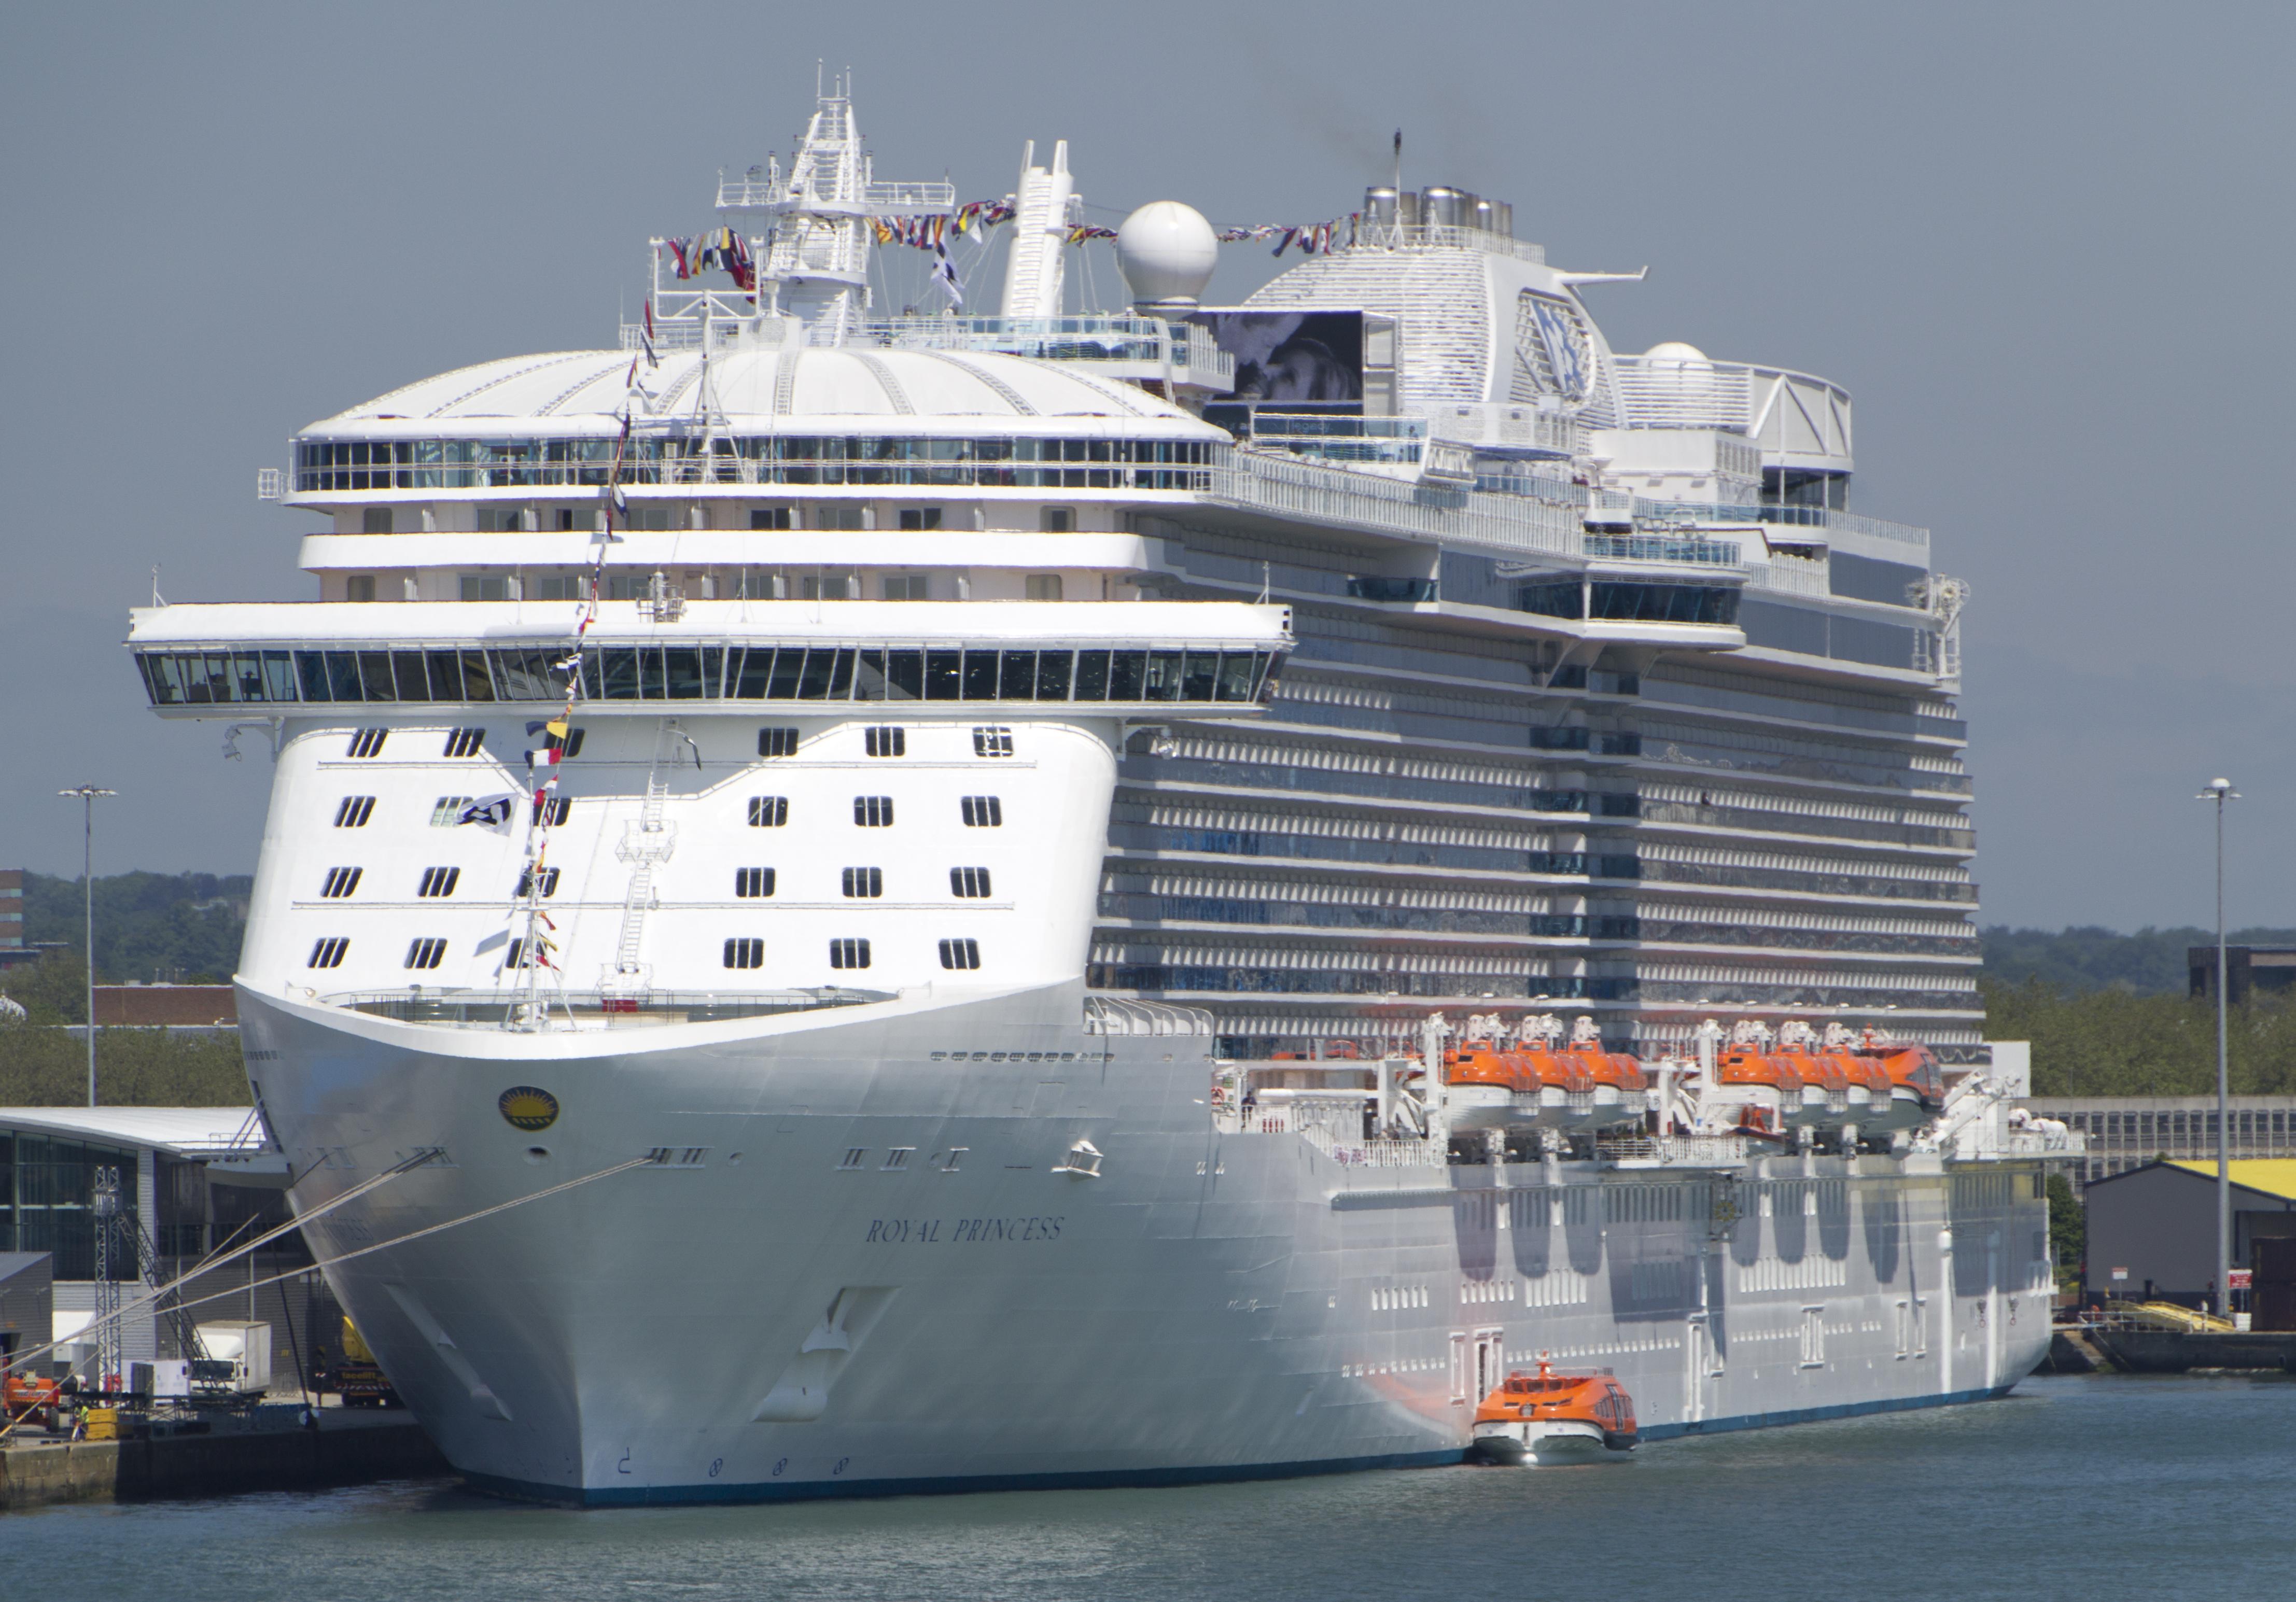 Royalclass Cruise Ship Wikiwand - Princess cruise ship fire